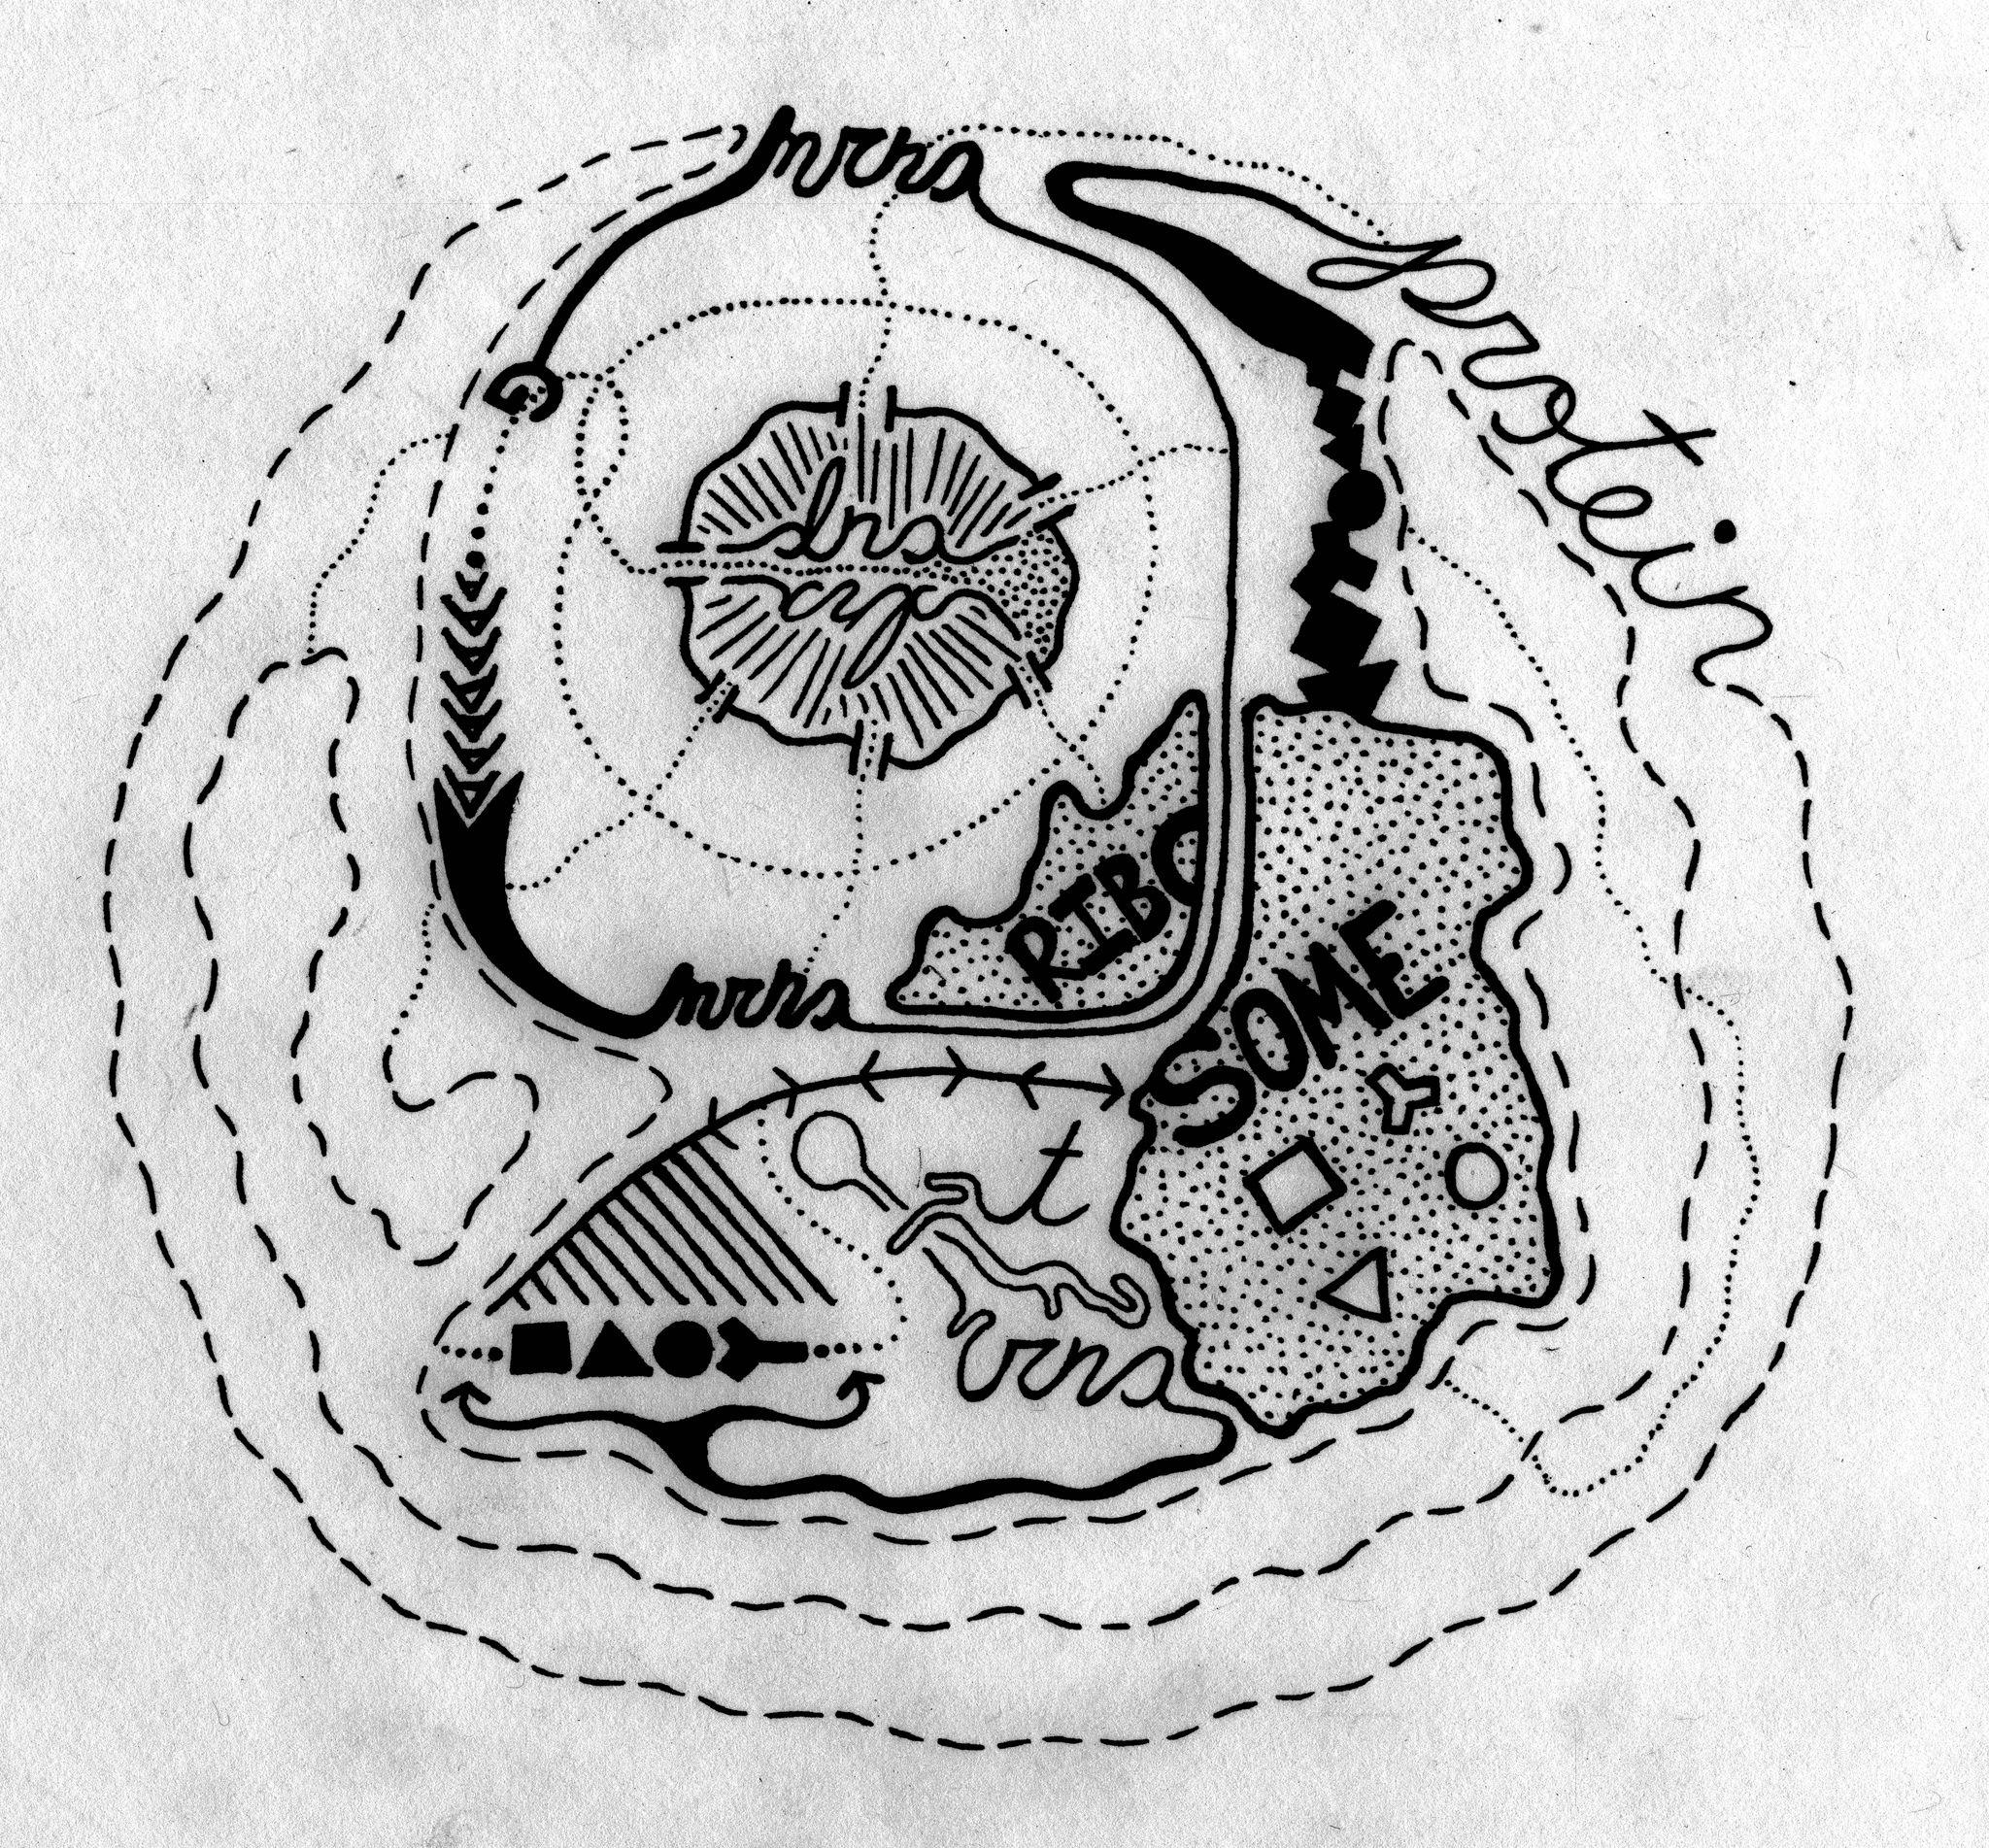 "'De-Central Dogma"" by Daniel Friedman"